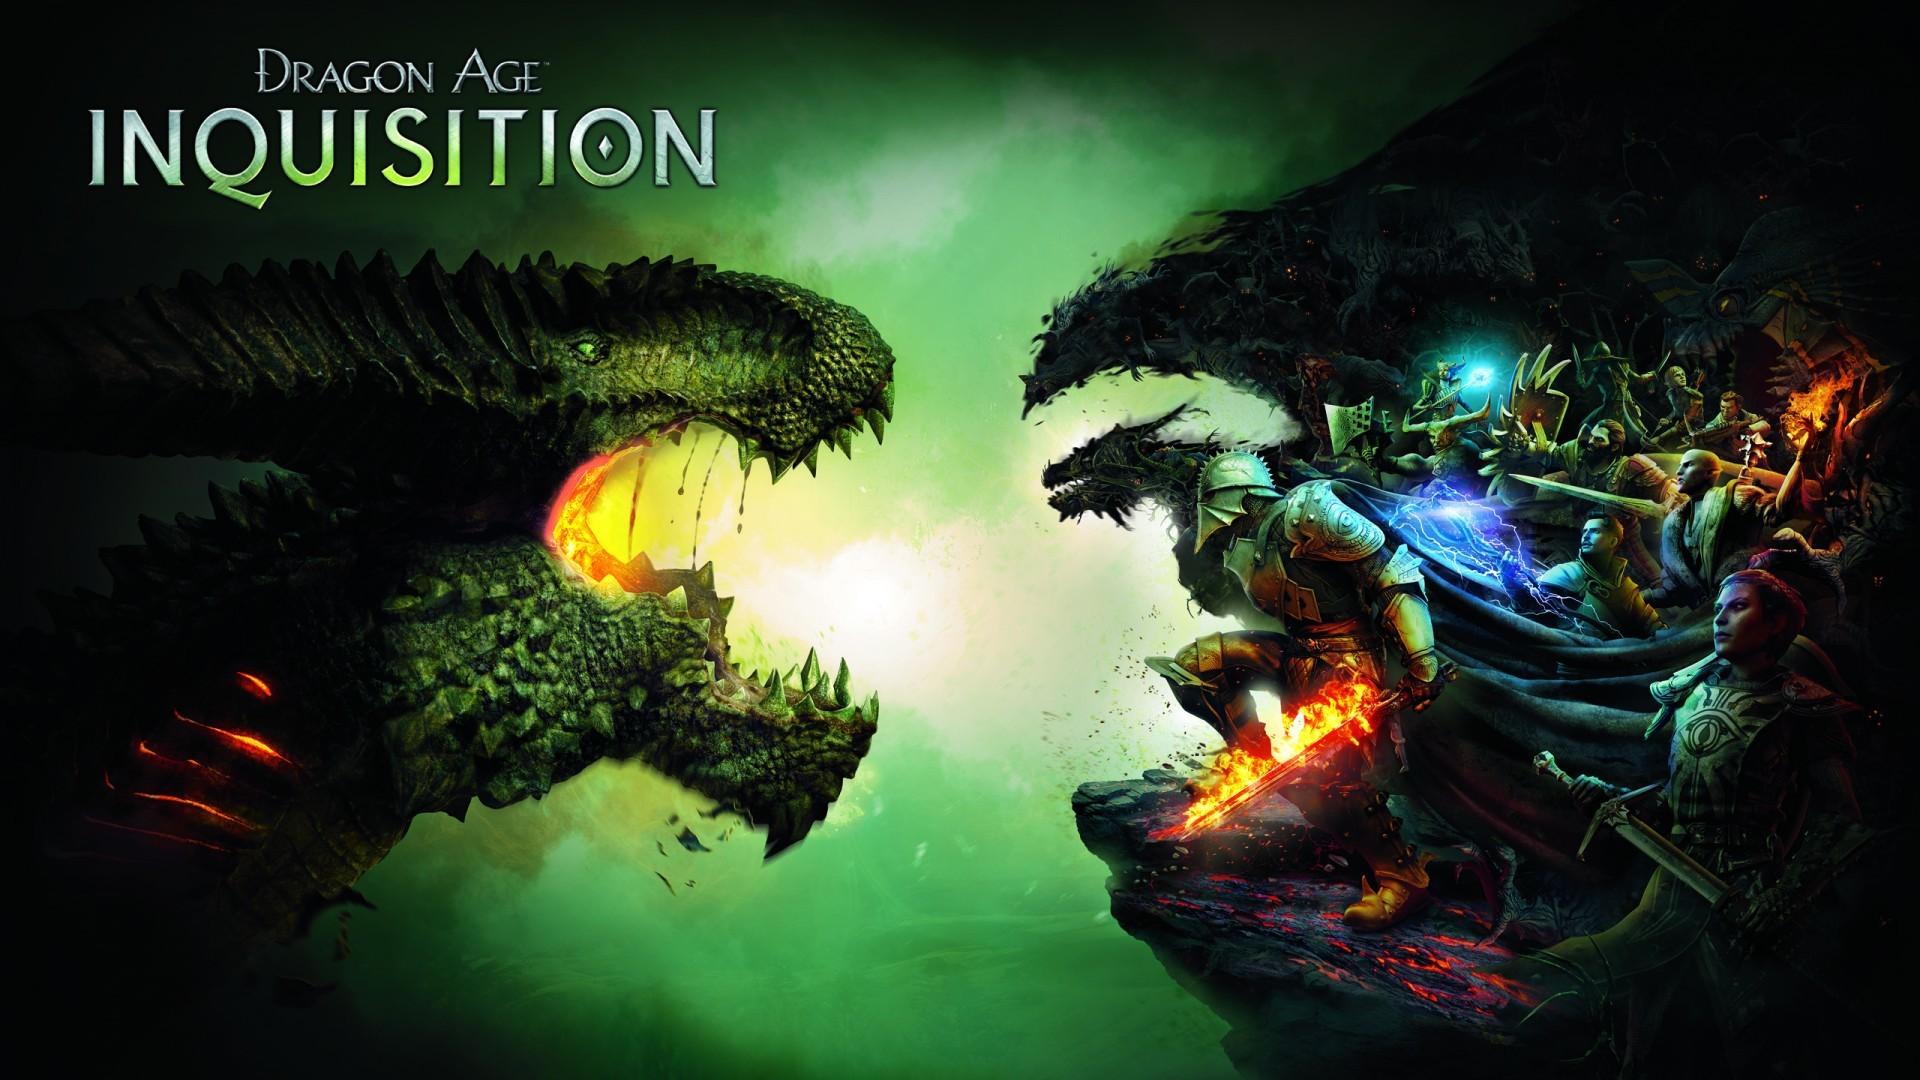 … x 1080 2560 x 1440 Original. Description: Download Dragon Age  Inquisition Game Games wallpaper …